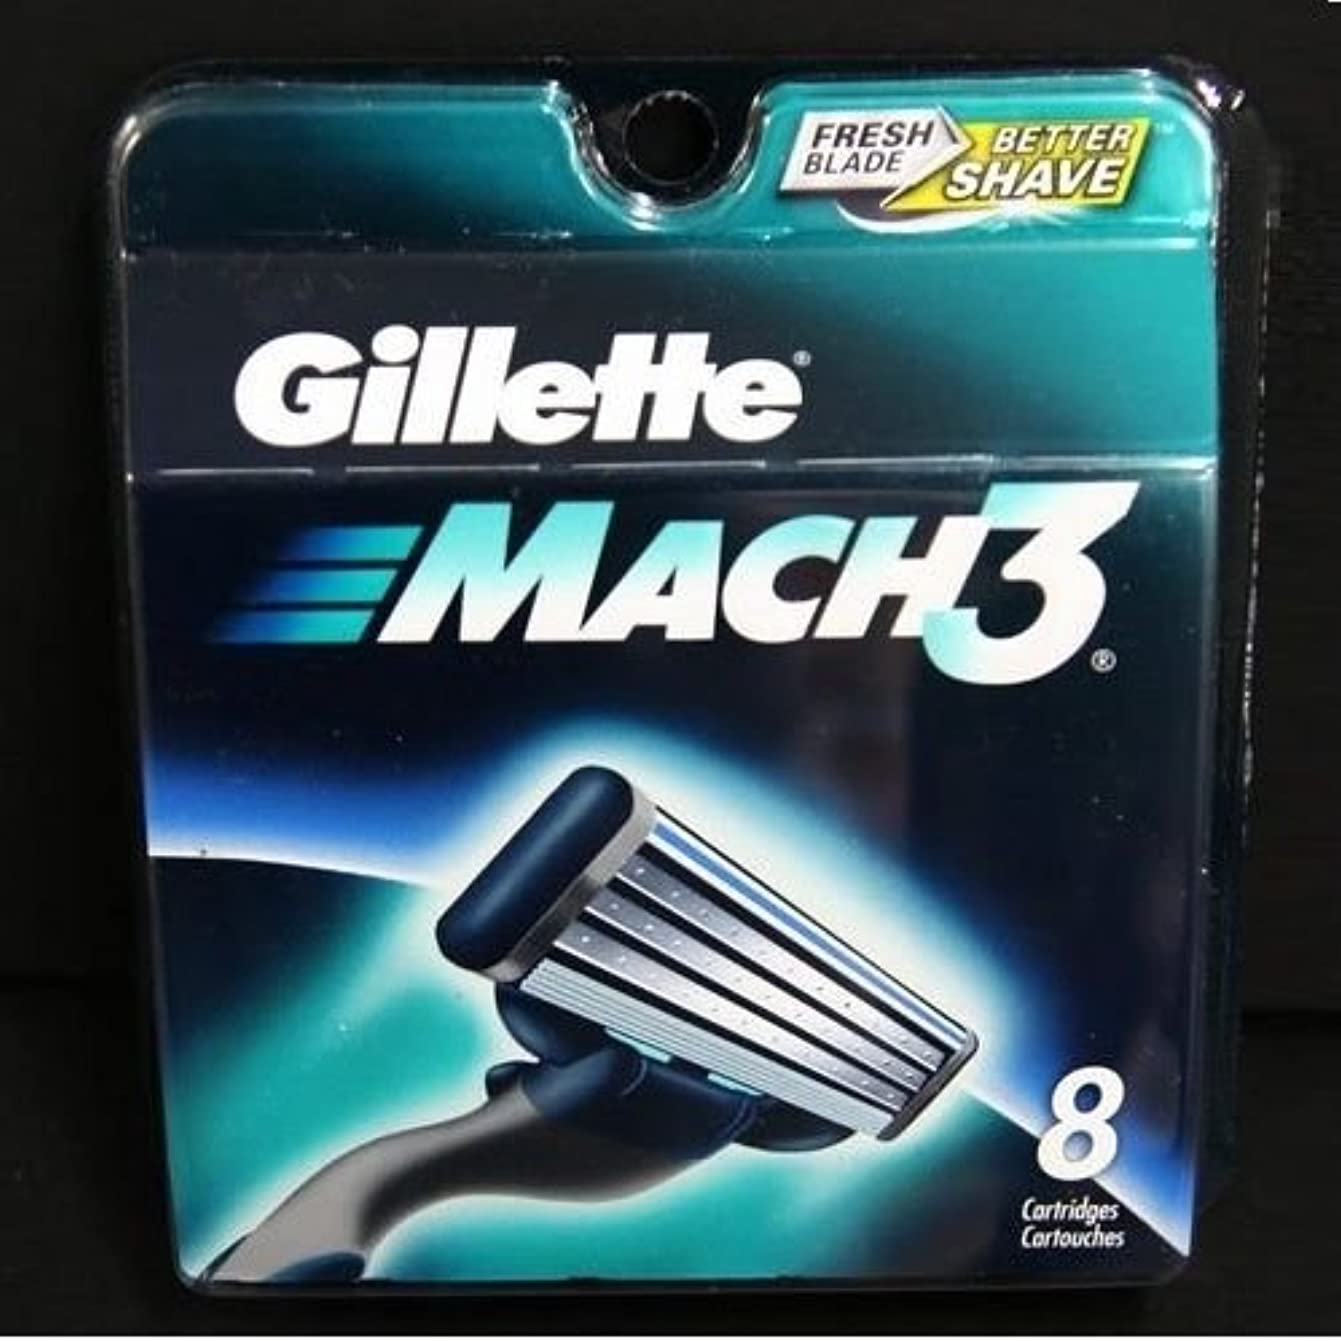 Gillette MACH3 SHAVING RAZOR カートリッジブレード 8 Pack [並行輸入品]